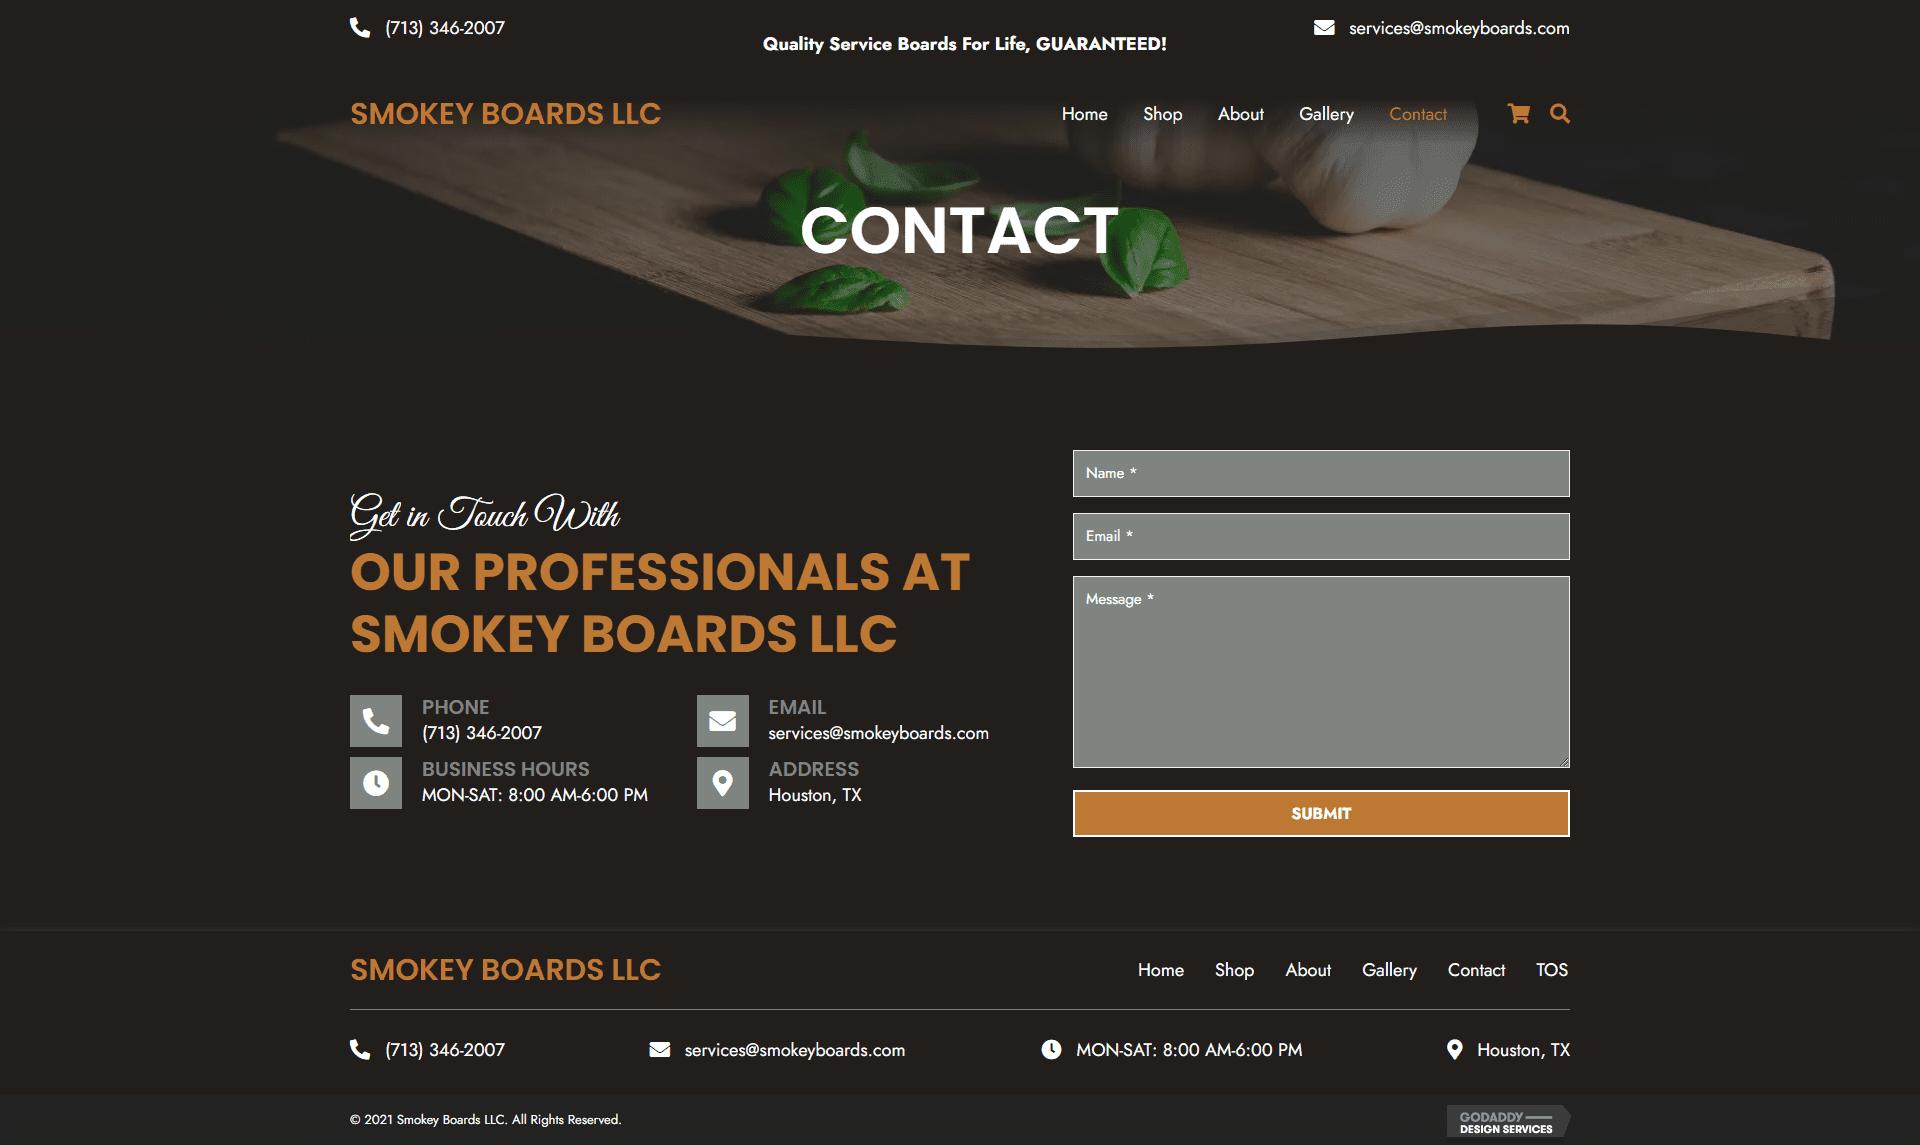 Smokey Boards LLC Contact